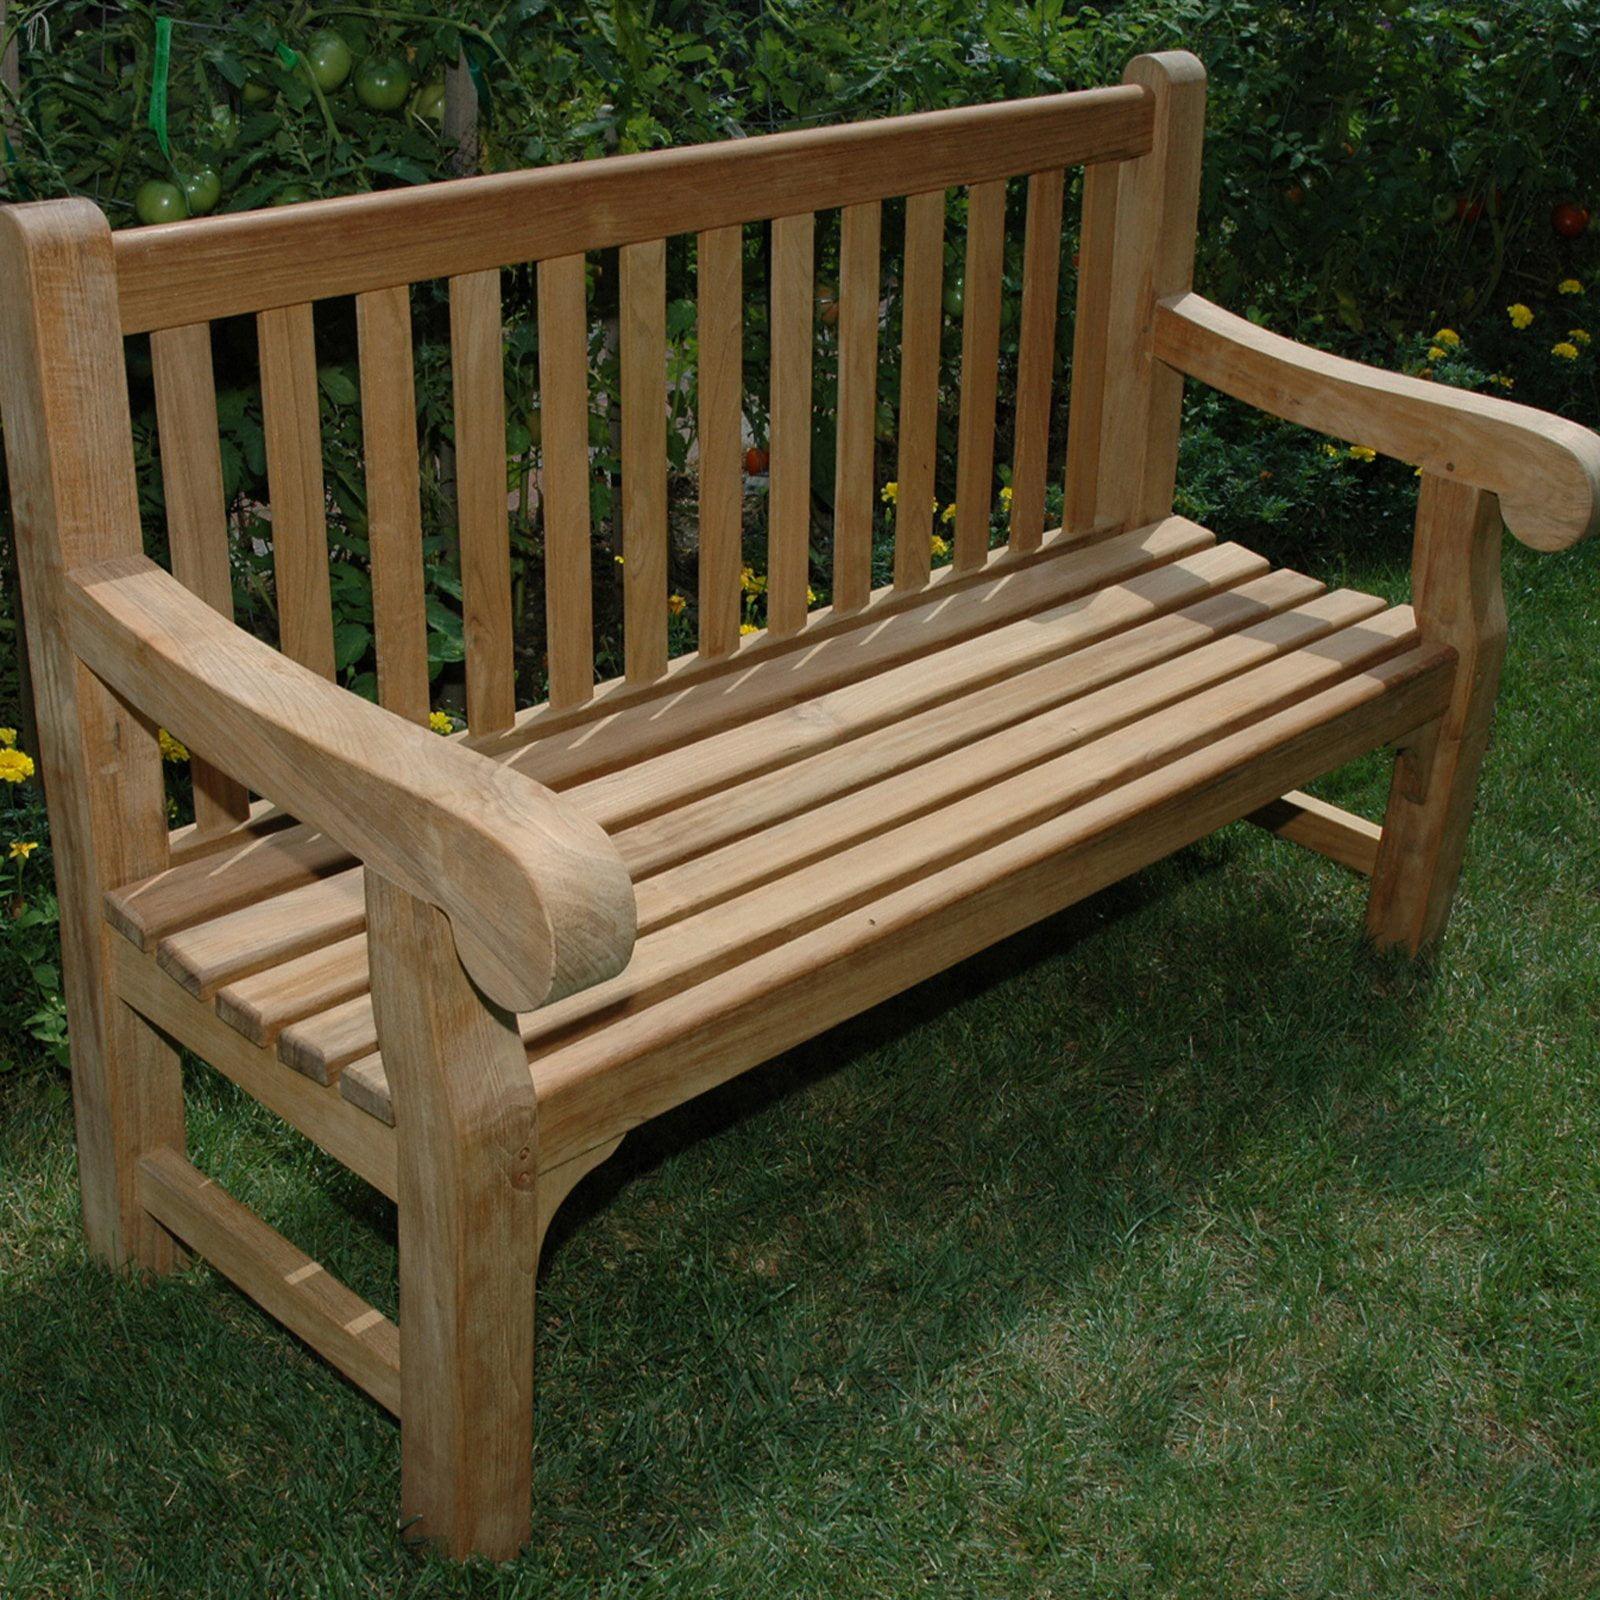 Regal Teak Hyde Park Teak Bench 5 ft. by Regal Teak